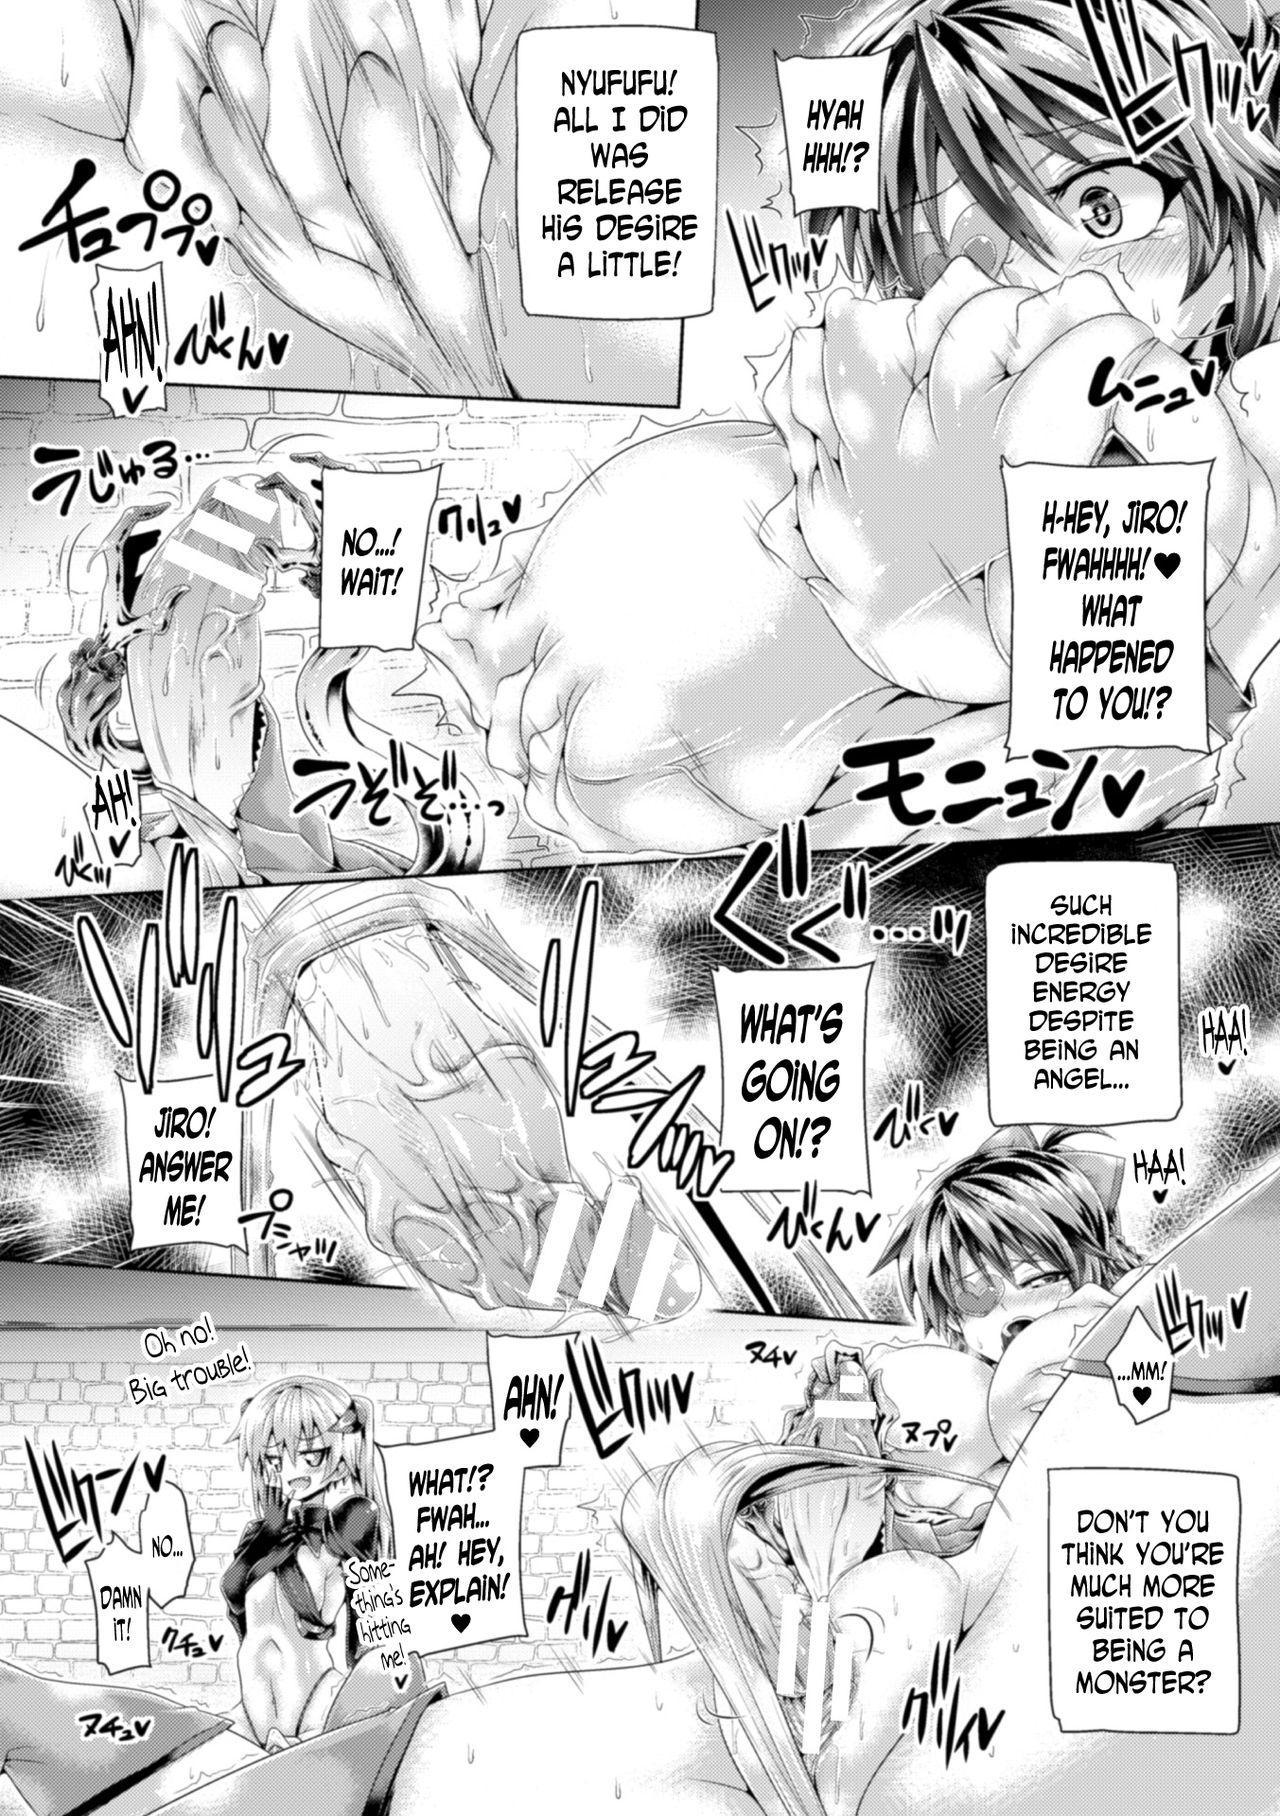 [Anthology] 2D Comic Magazine Tenshi ni Ochiru Akuma-tachi Vol. 1 Ch. 1-2 [English] [N04h] [Digital] 35